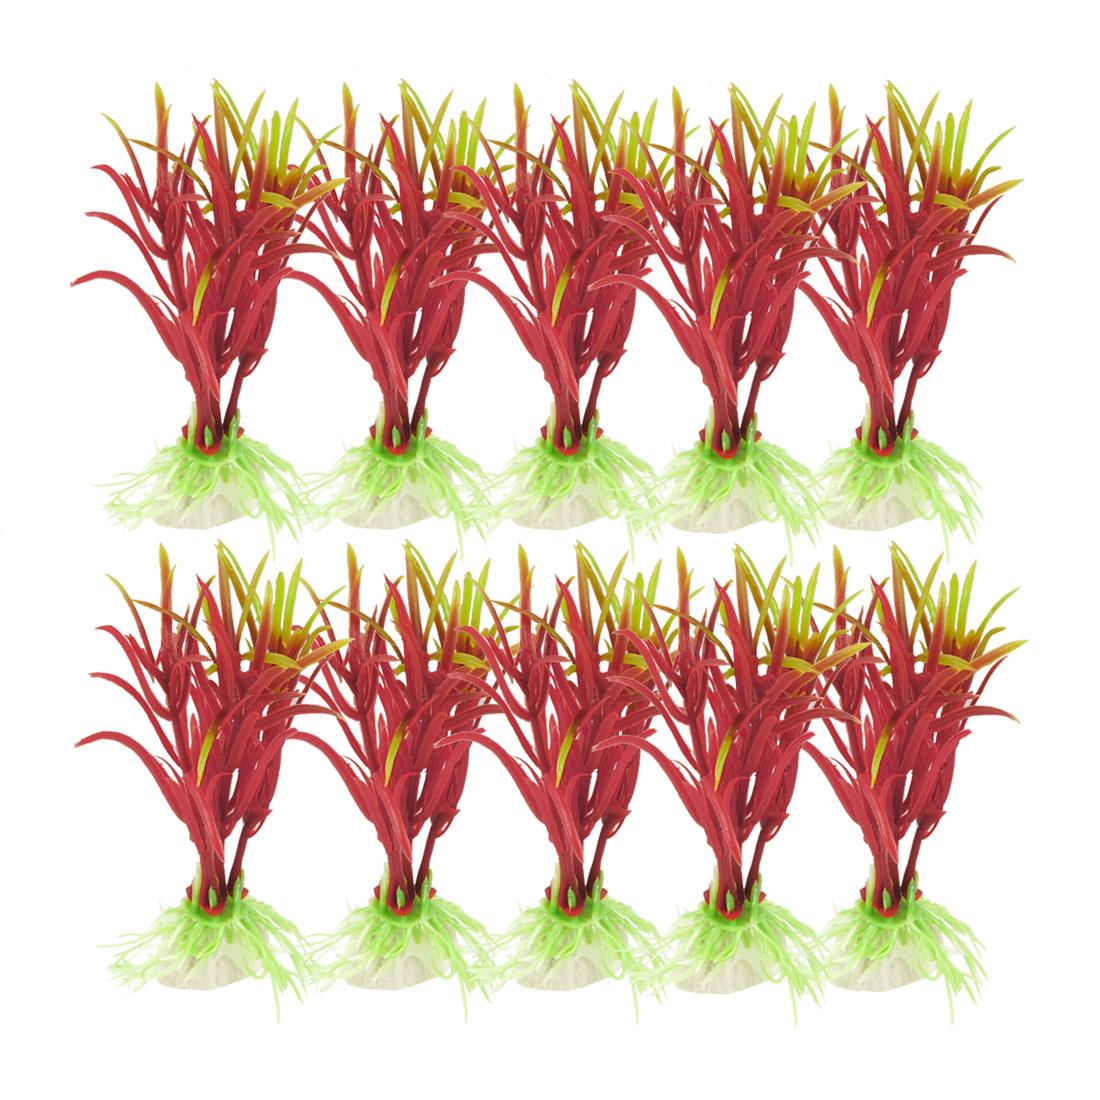 "10 Pcs 4.1"" Red Pale Green Plastic Grass Plants Adorn for Fish Tank Aquarium"